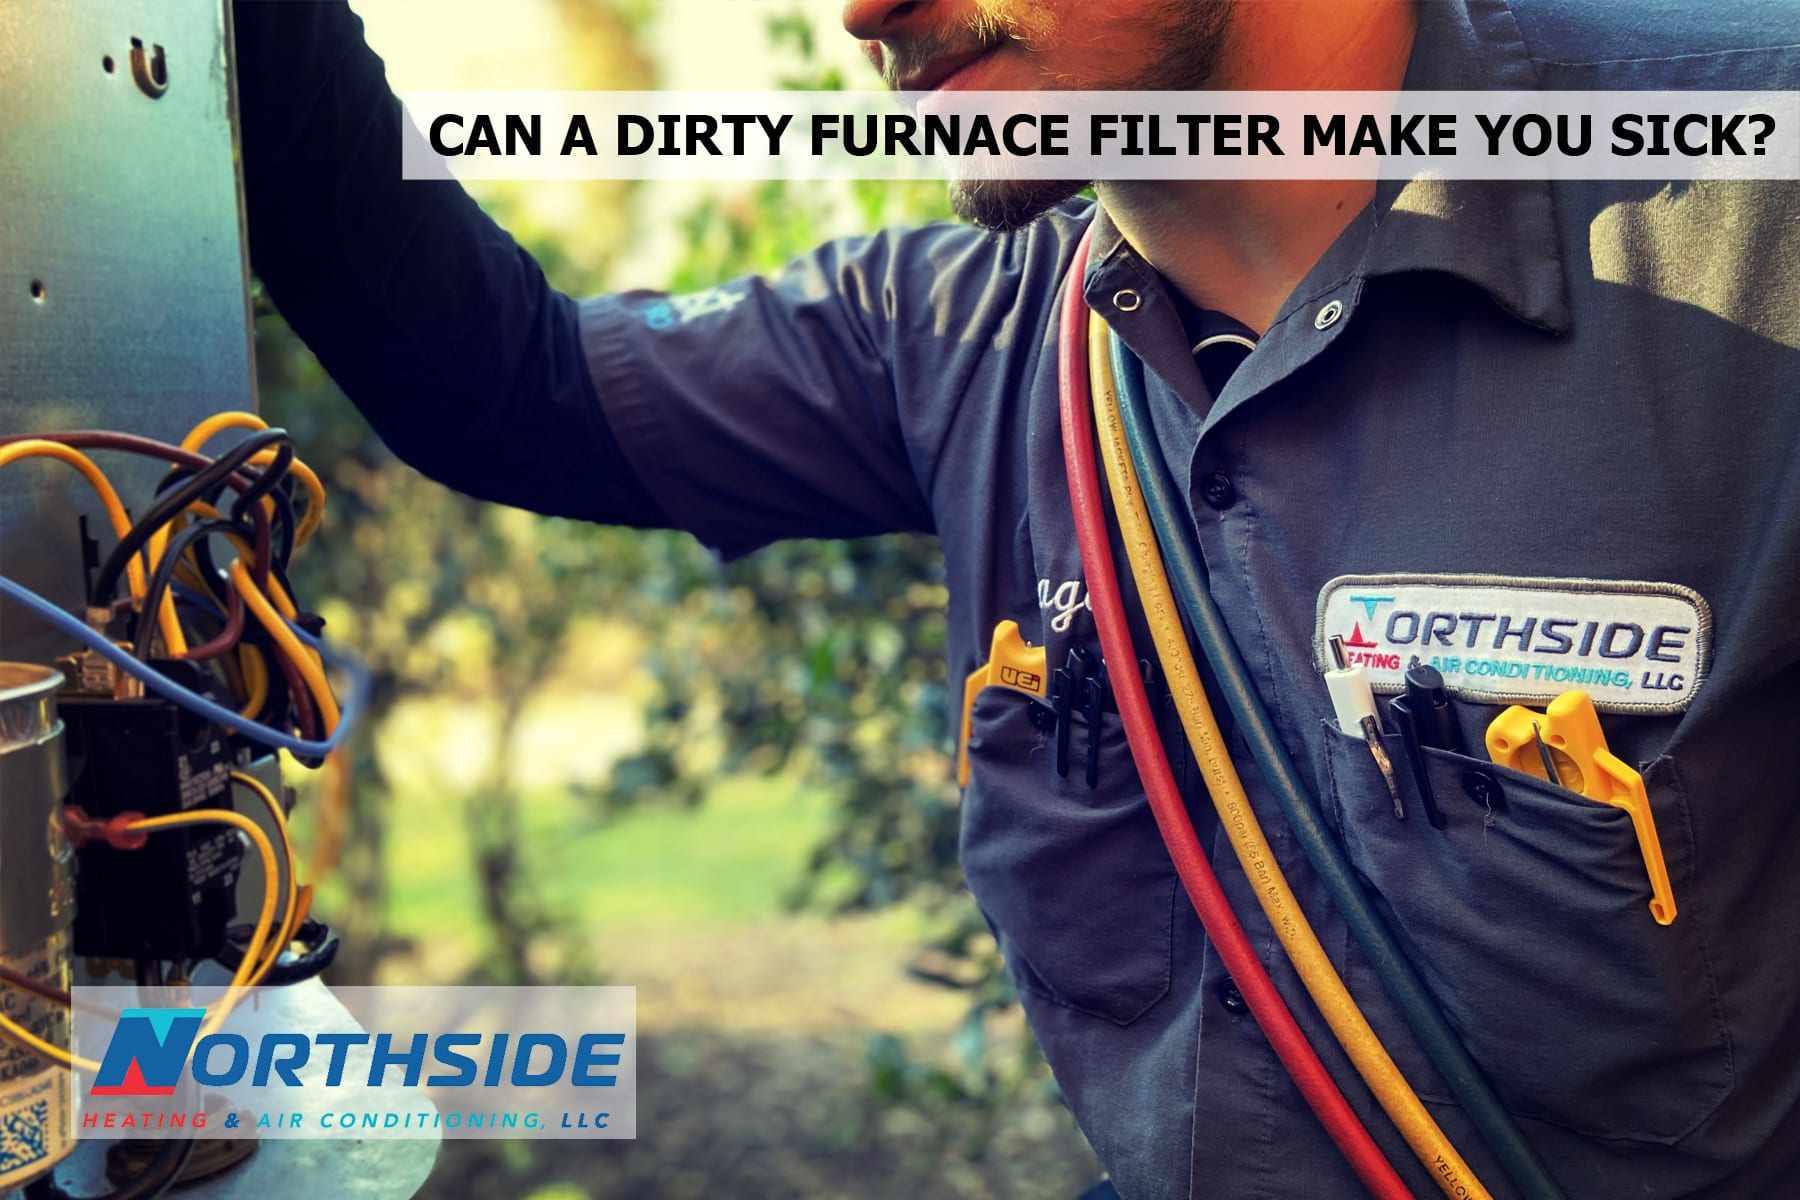 Can a dirty furnace filter make you sick?